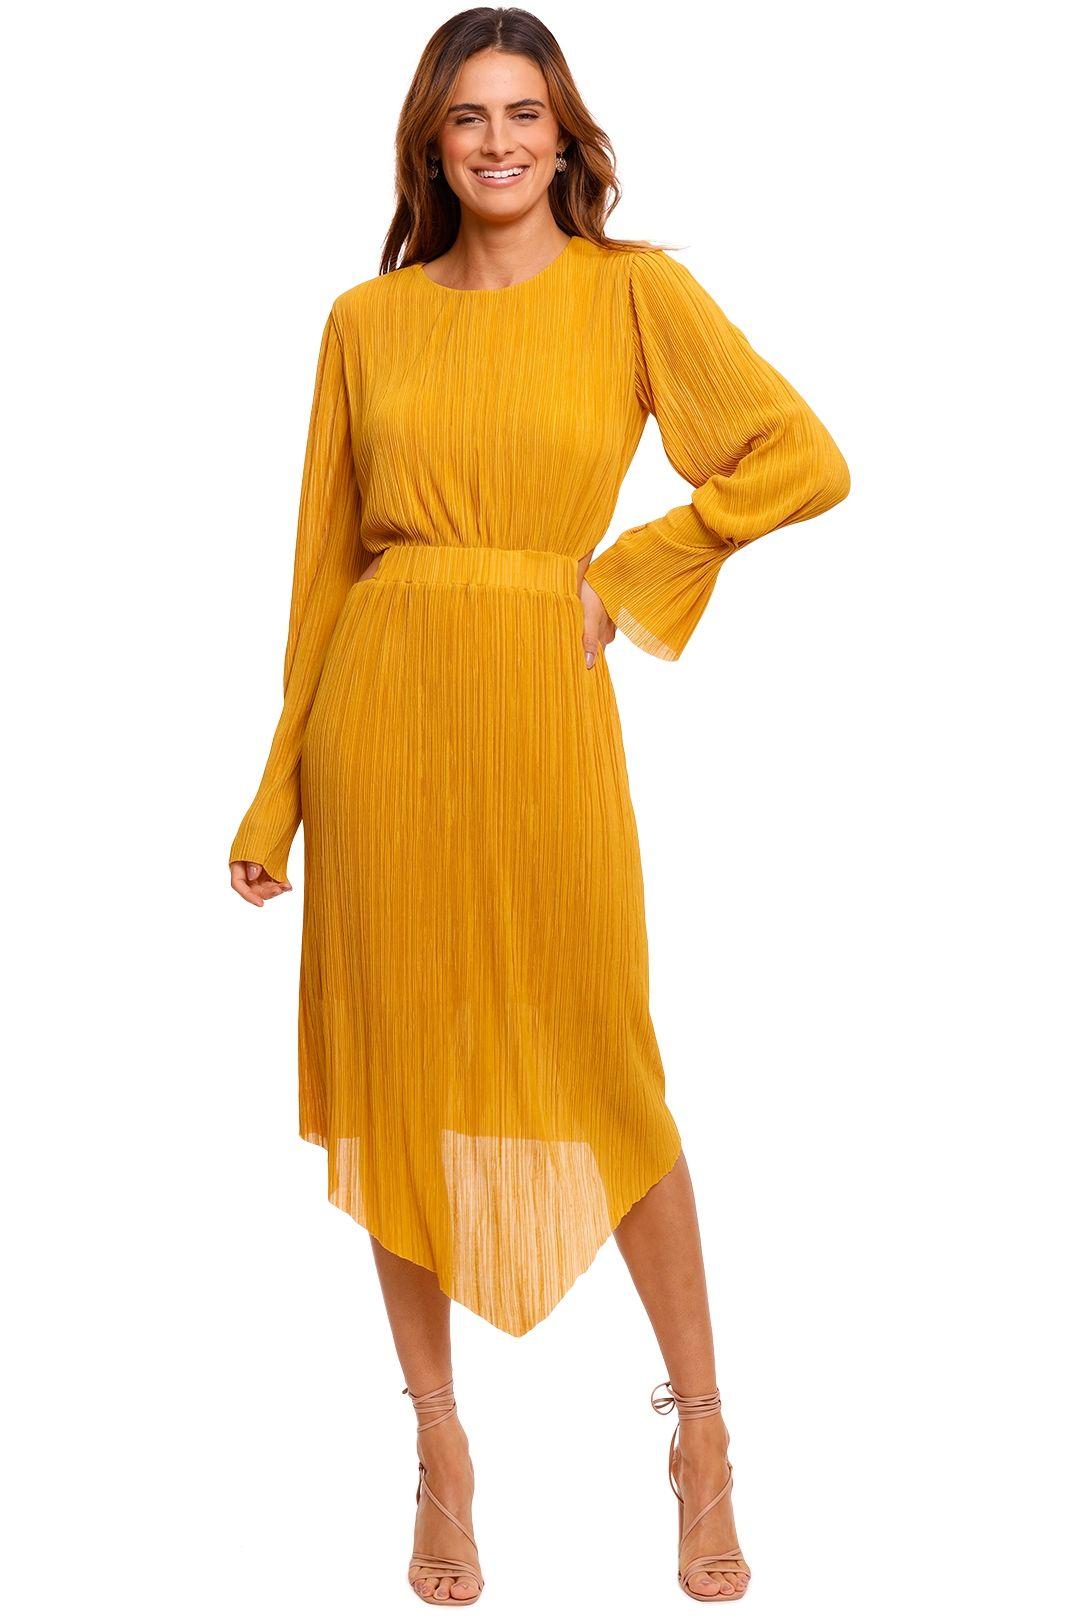 Willow Pleat Cut Away Dress Zest